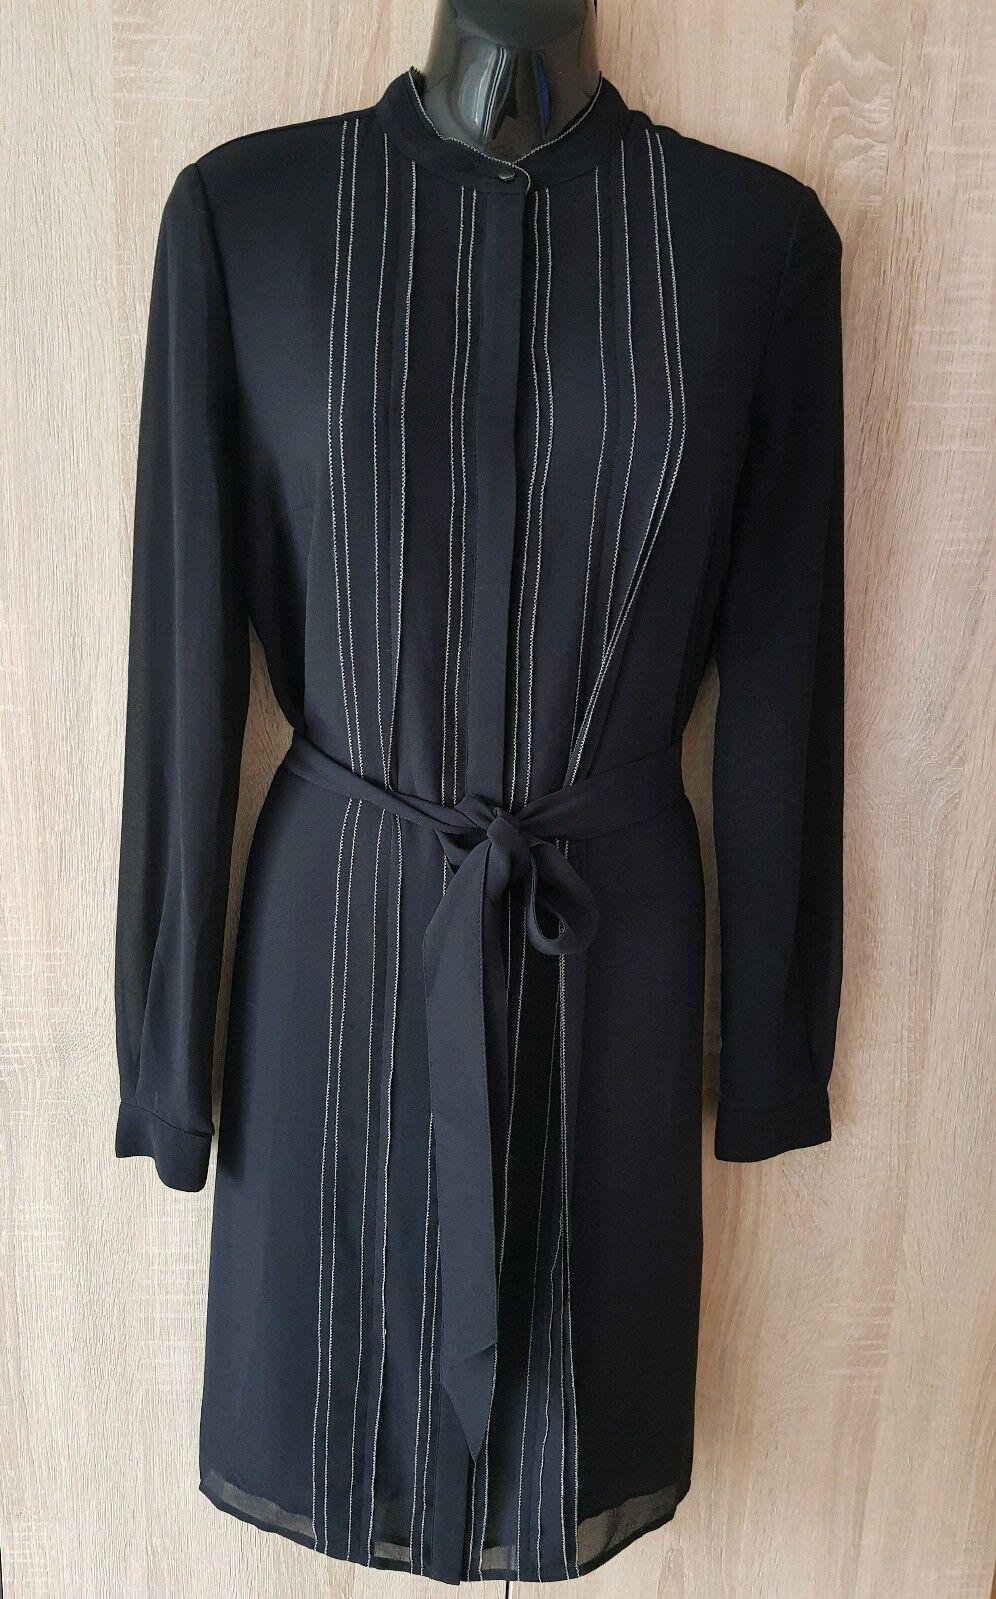 Belle Fête Soirée Femme REISS robe noire UK 8 US 4 EU 36